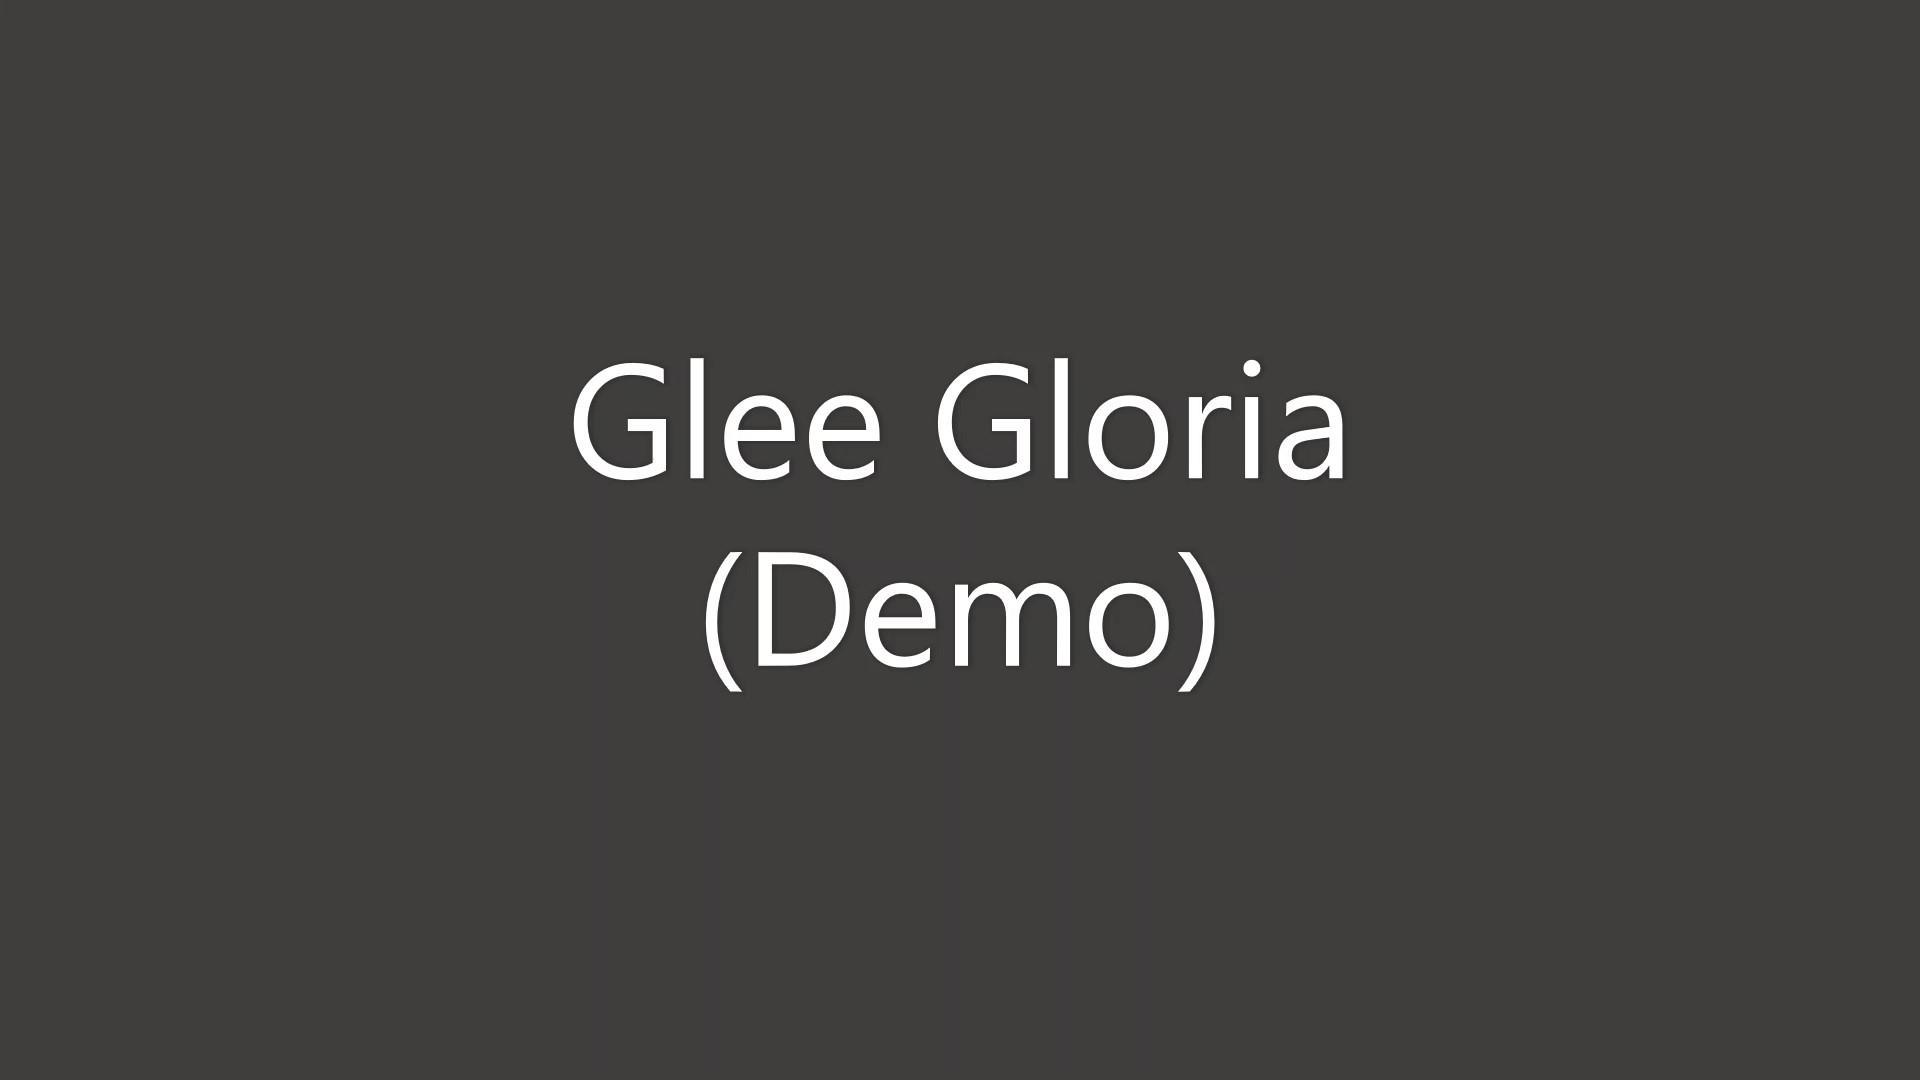 Glee Gloria Demo